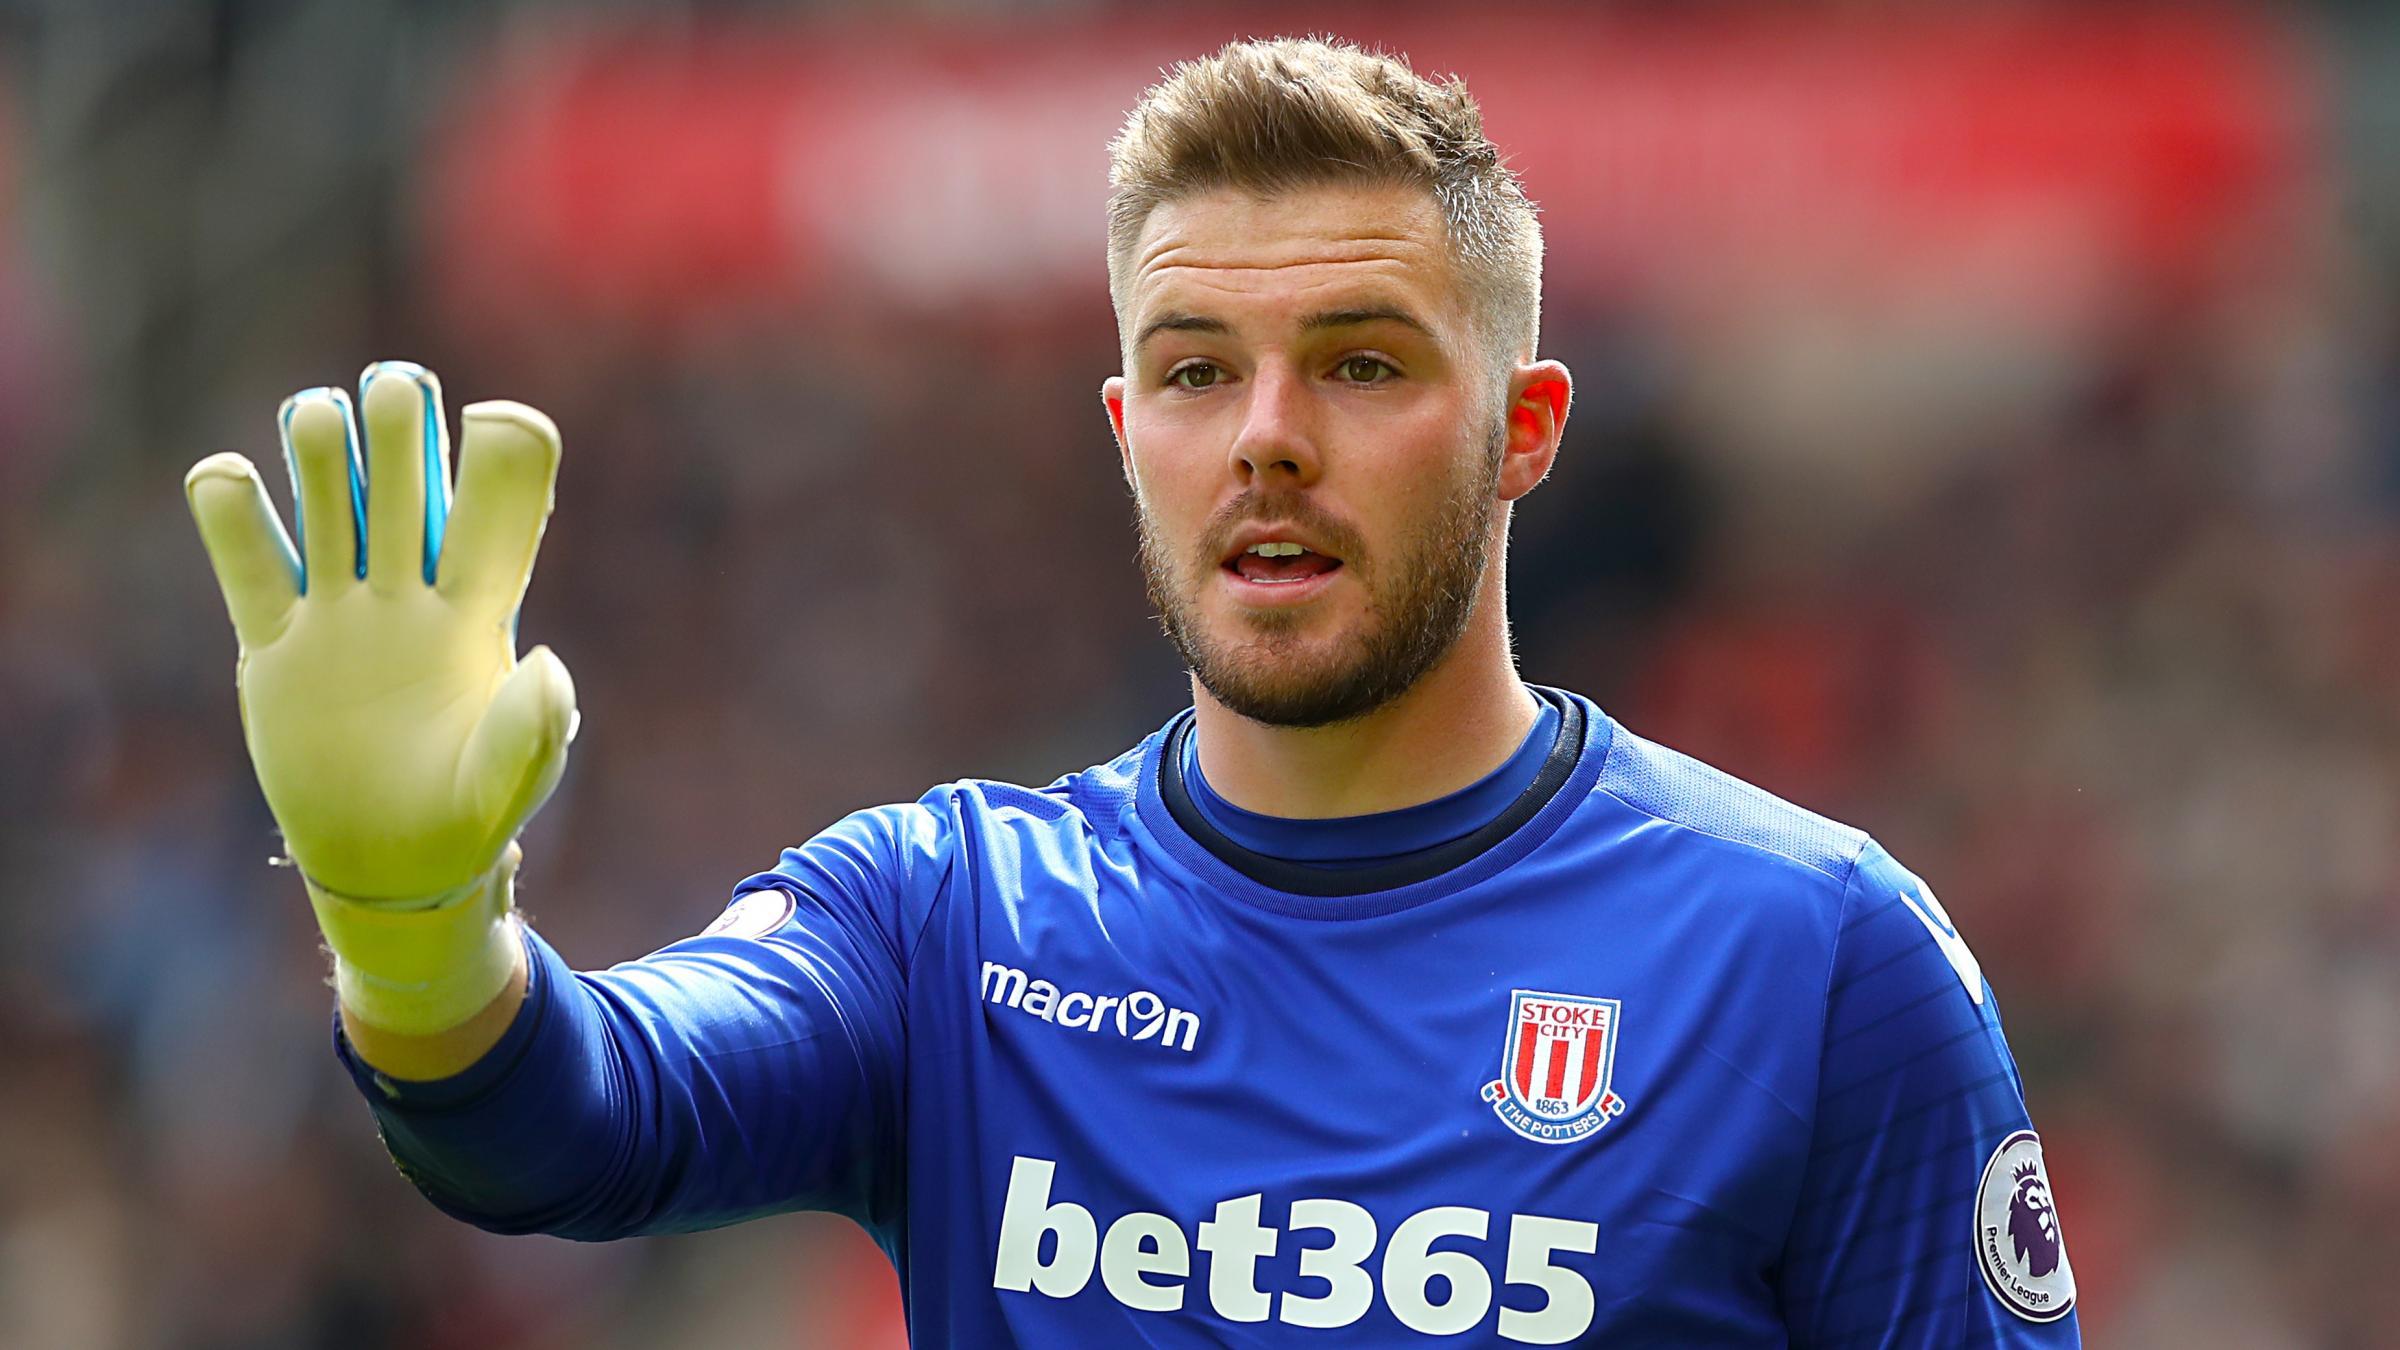 Wl wladimir klitschko wikipedia - Gareth Southgate Watches Jack Butland Protect Stoke Goal From Hammers Hillingdon Times